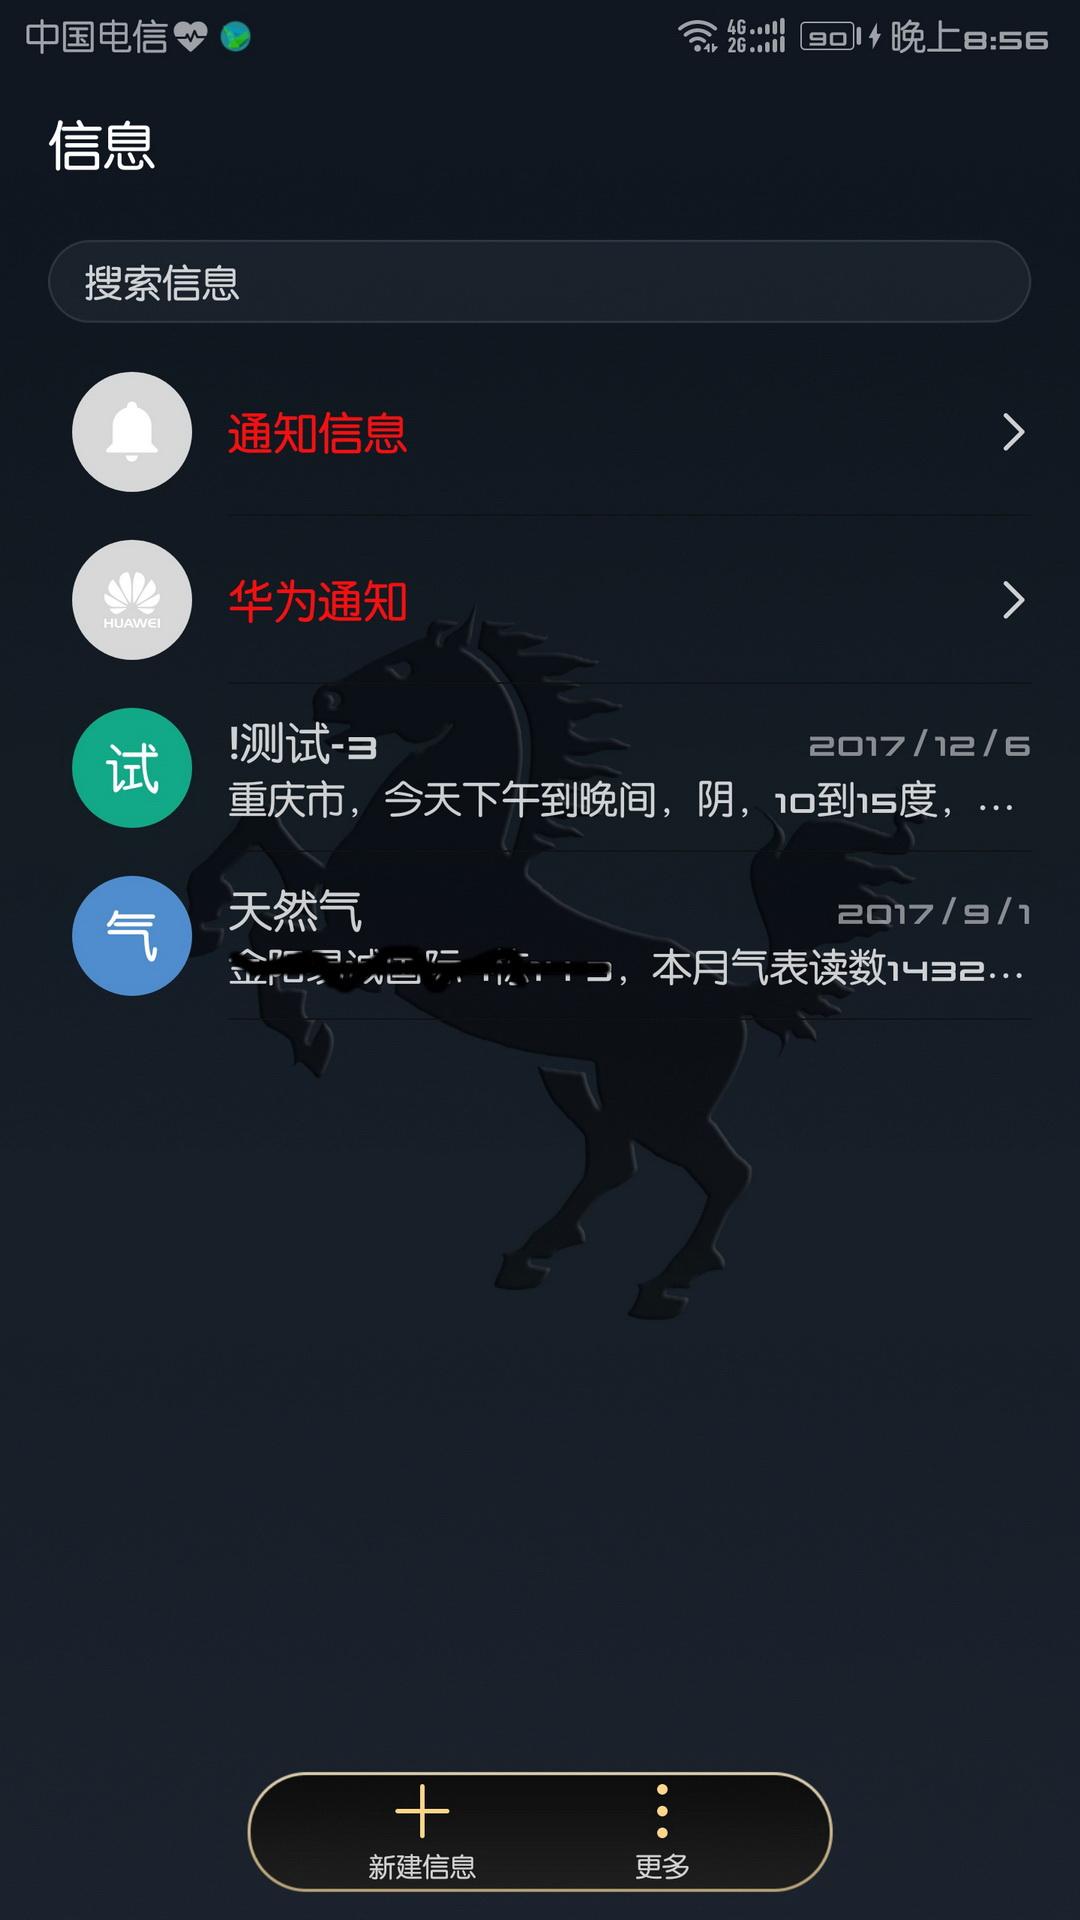 preview_mms_0.jpg